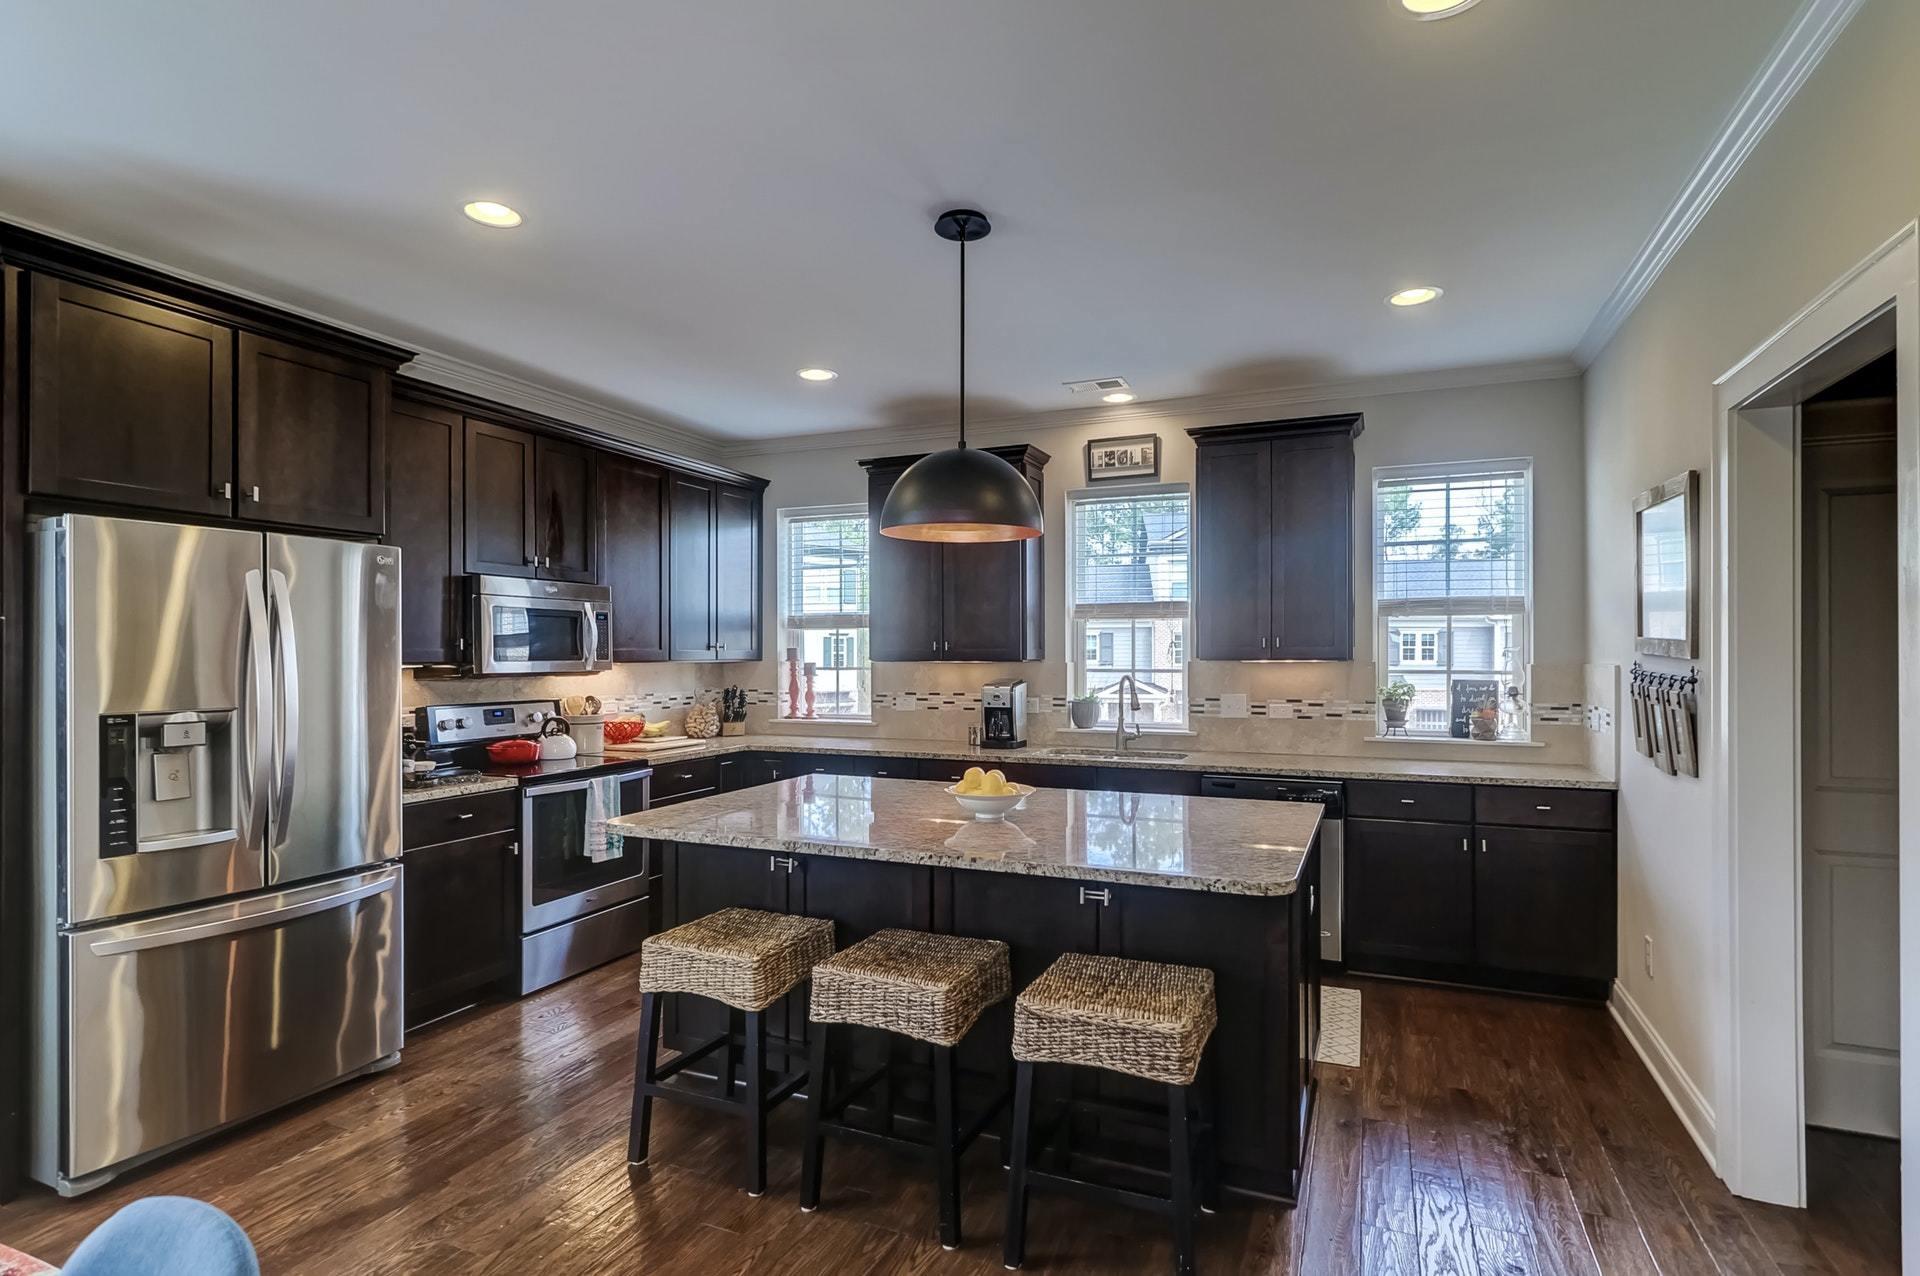 Etiwan Pointe Homes For Sale - 220 Slipper Shell, Mount Pleasant, SC - 24